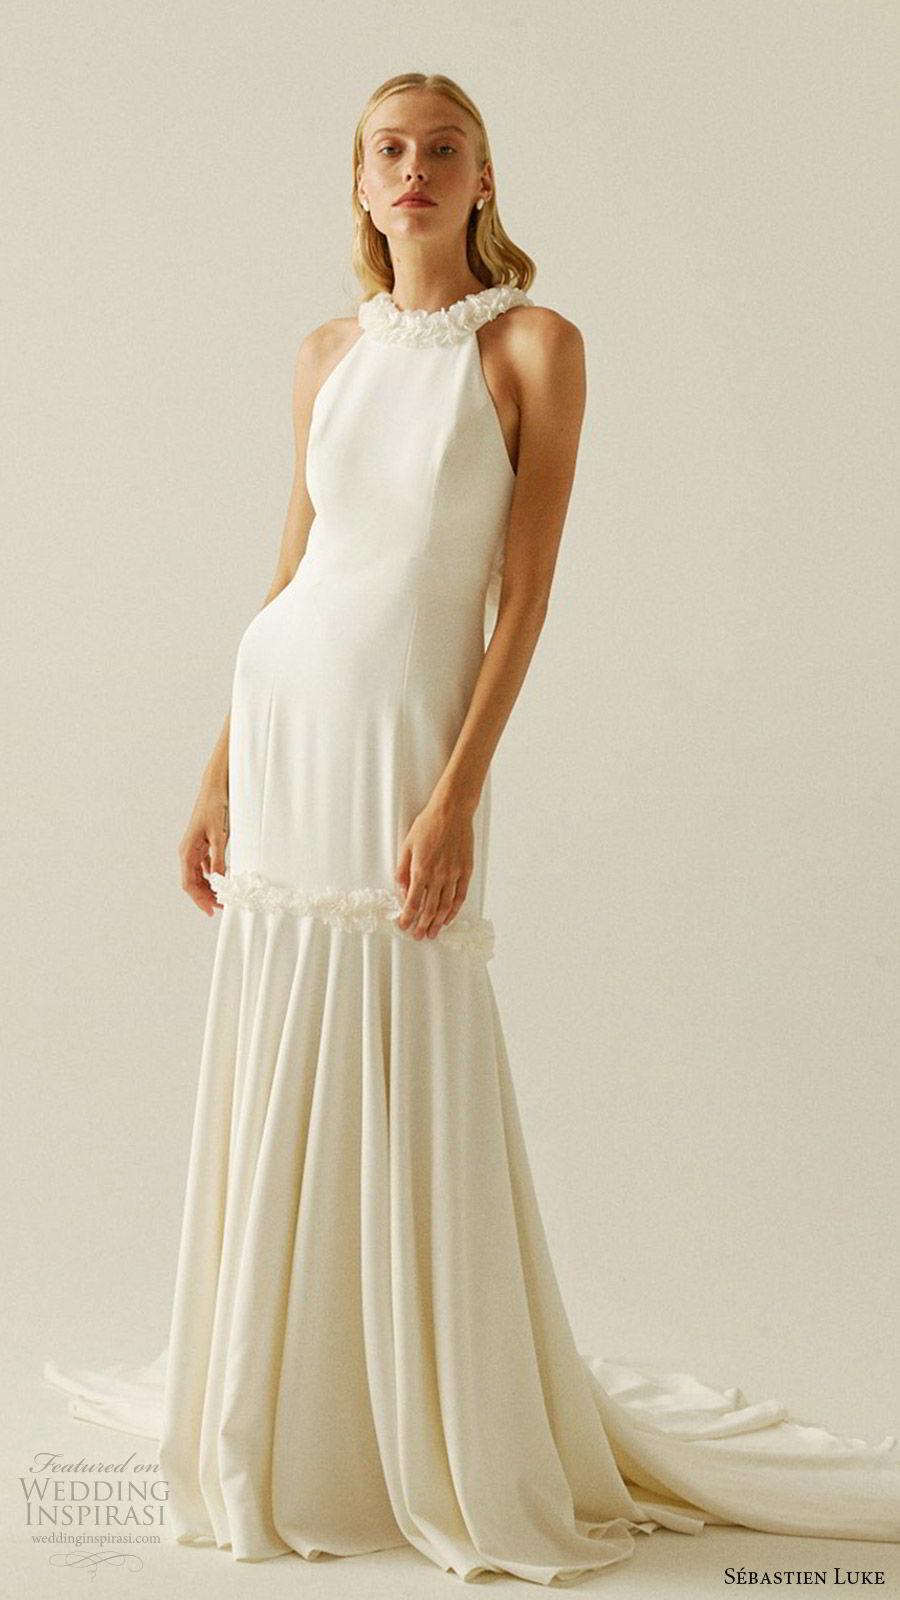 sebastien luke fall 2019 bridal sleeveless halter neck minimally embellished mermaid wedding dress clean simple modern chapel train (8) mv